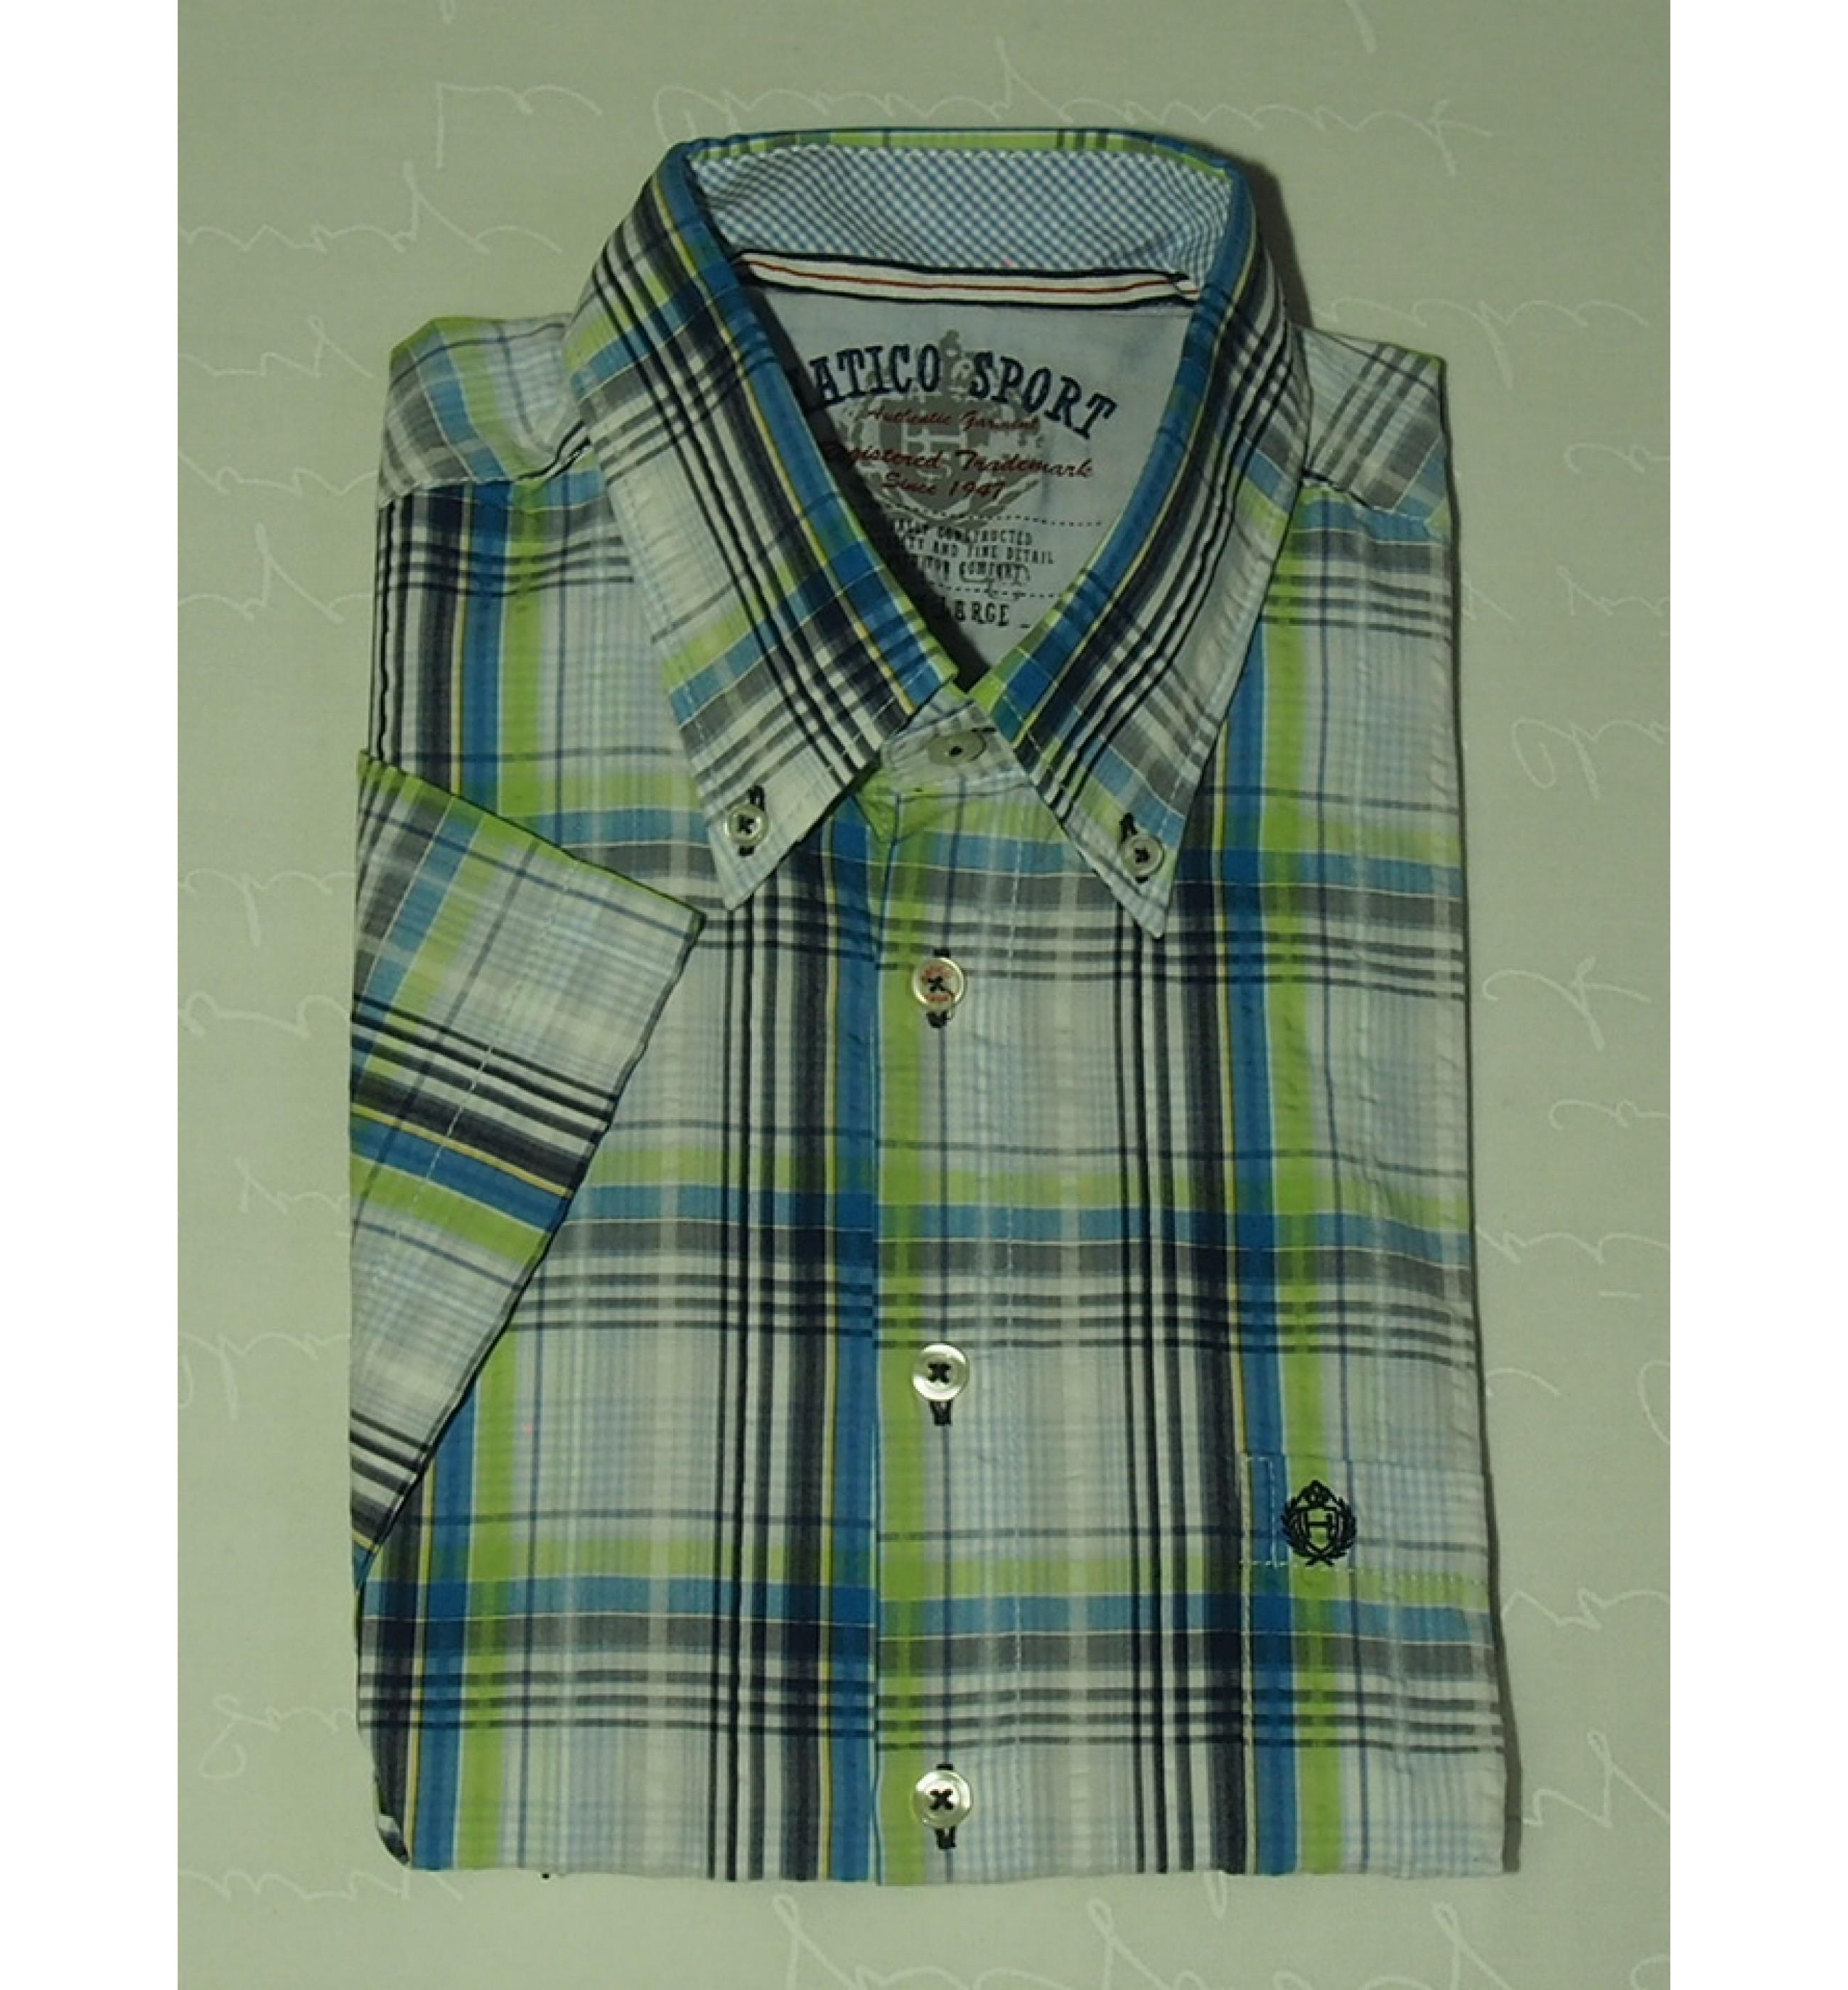 Мужская рубашка Hatico 70020 5113 44